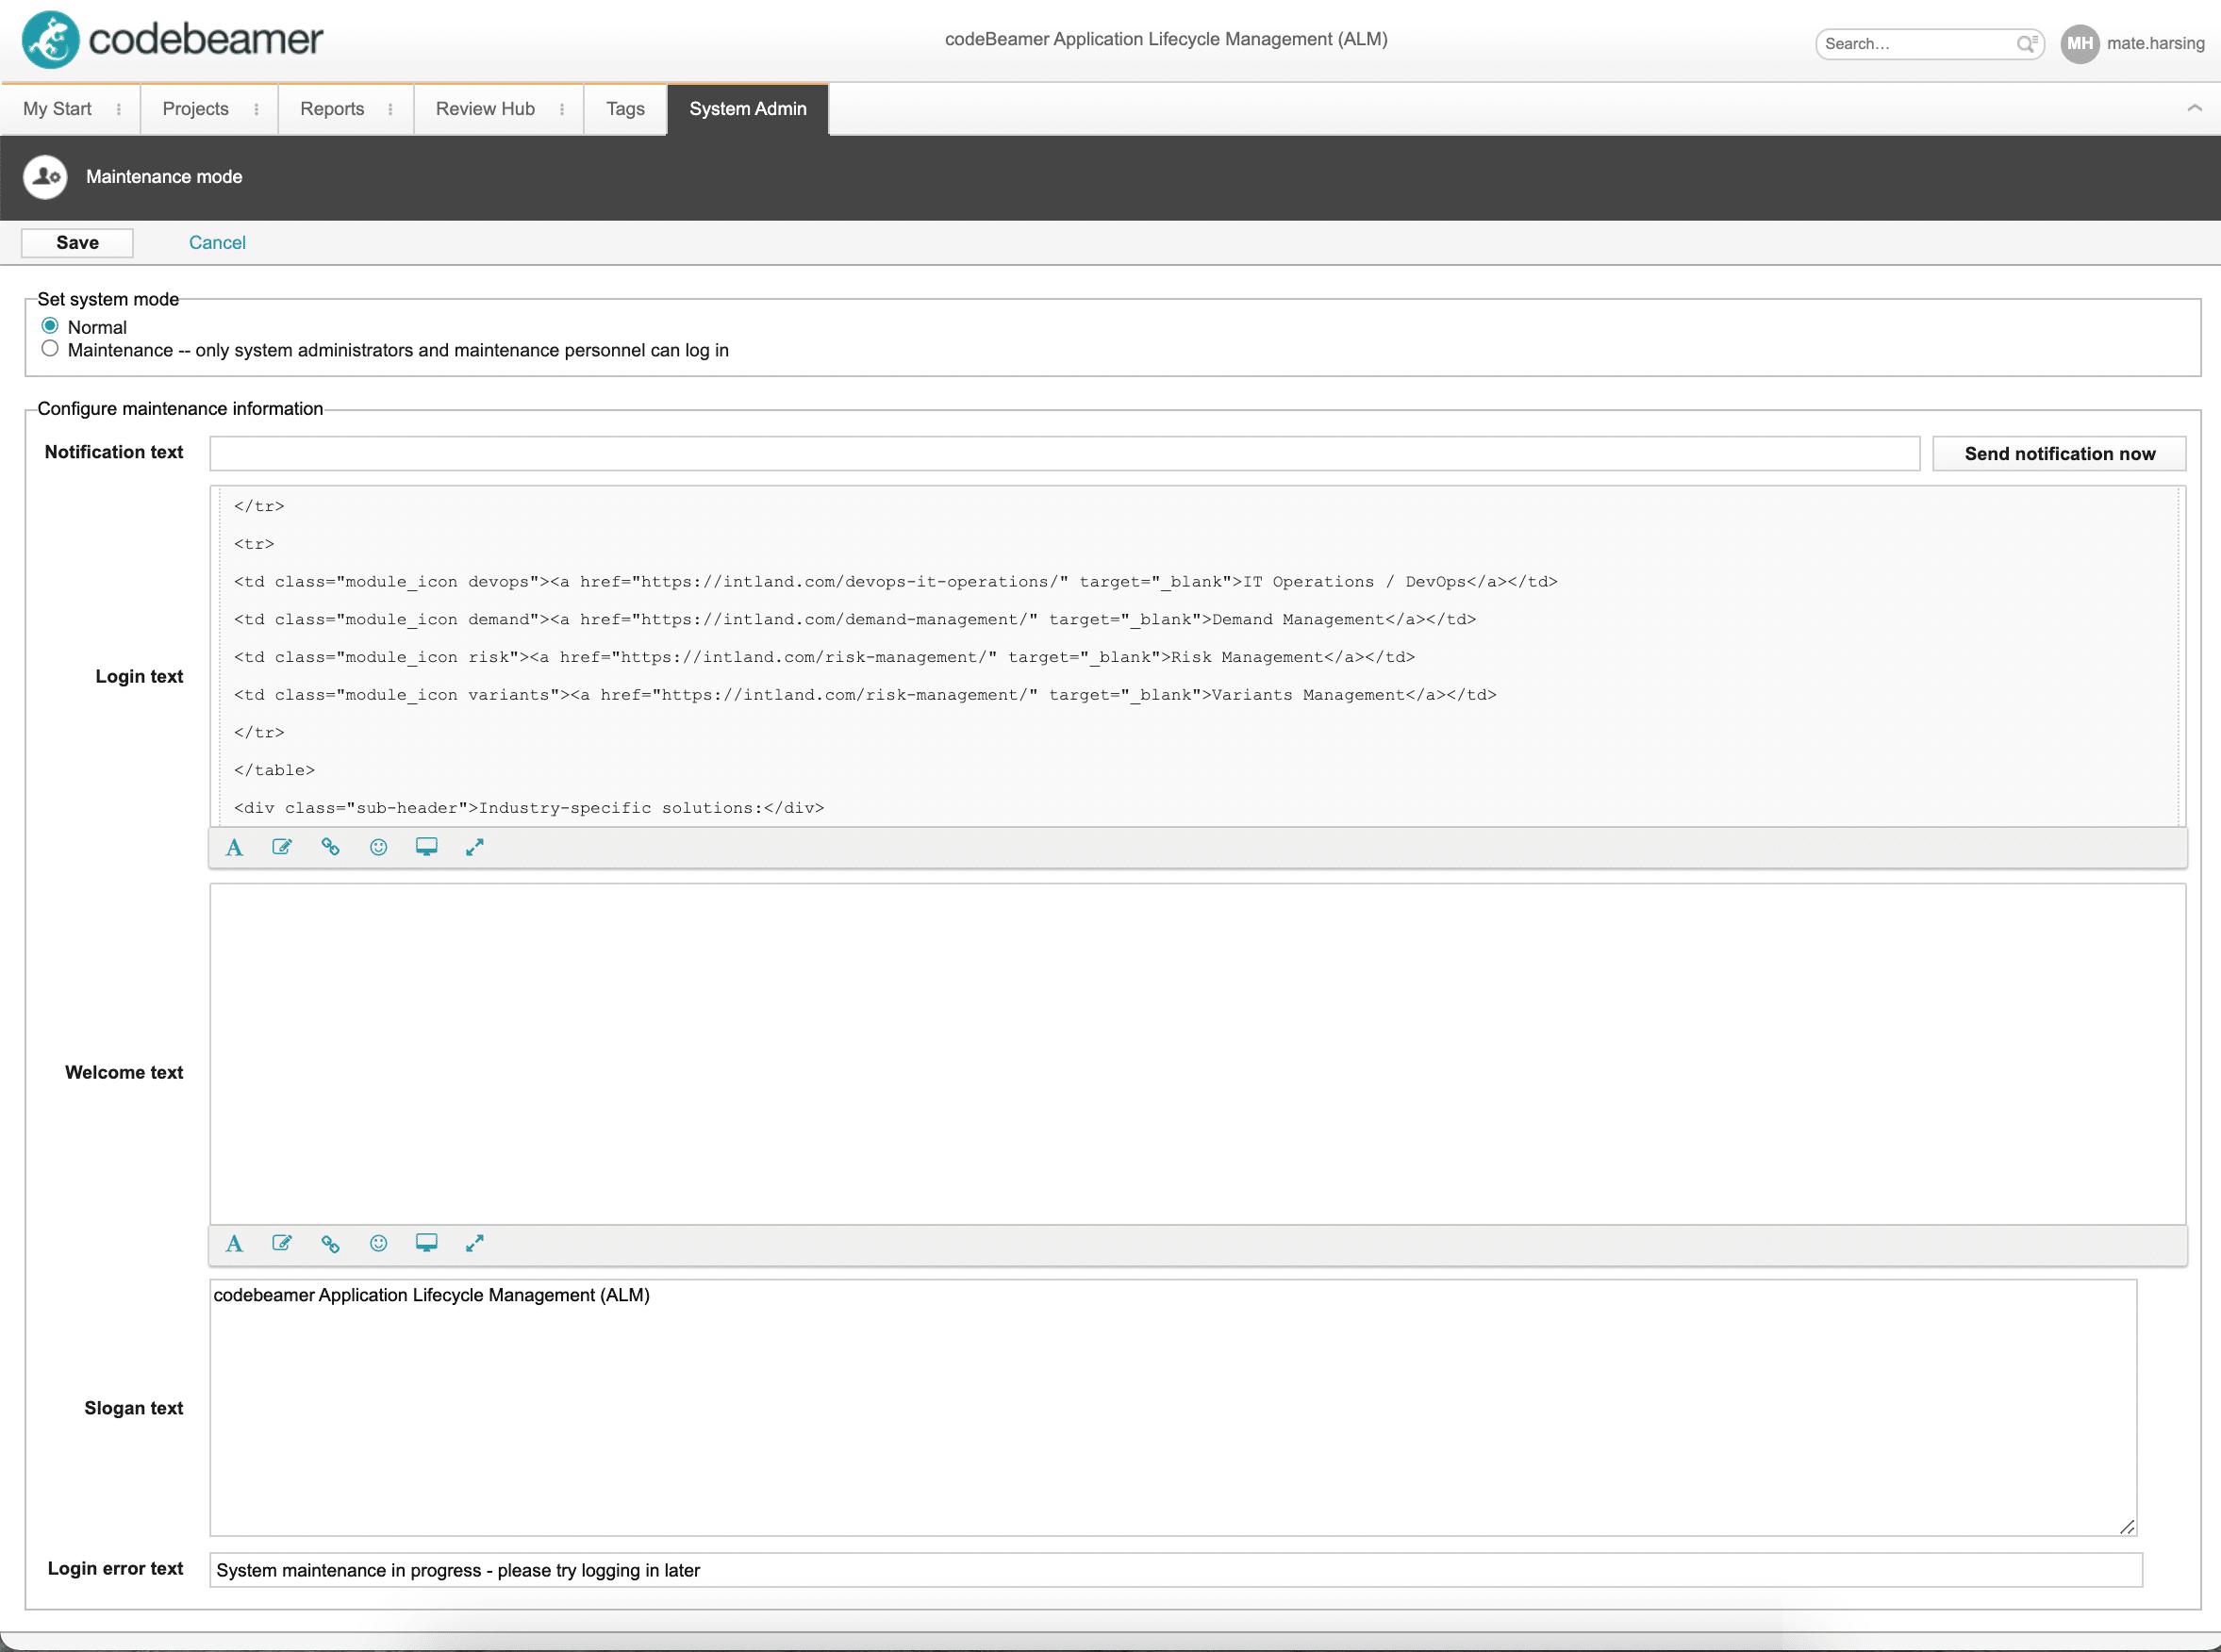 maintenance-mode codebeamer 21.09 is Released!